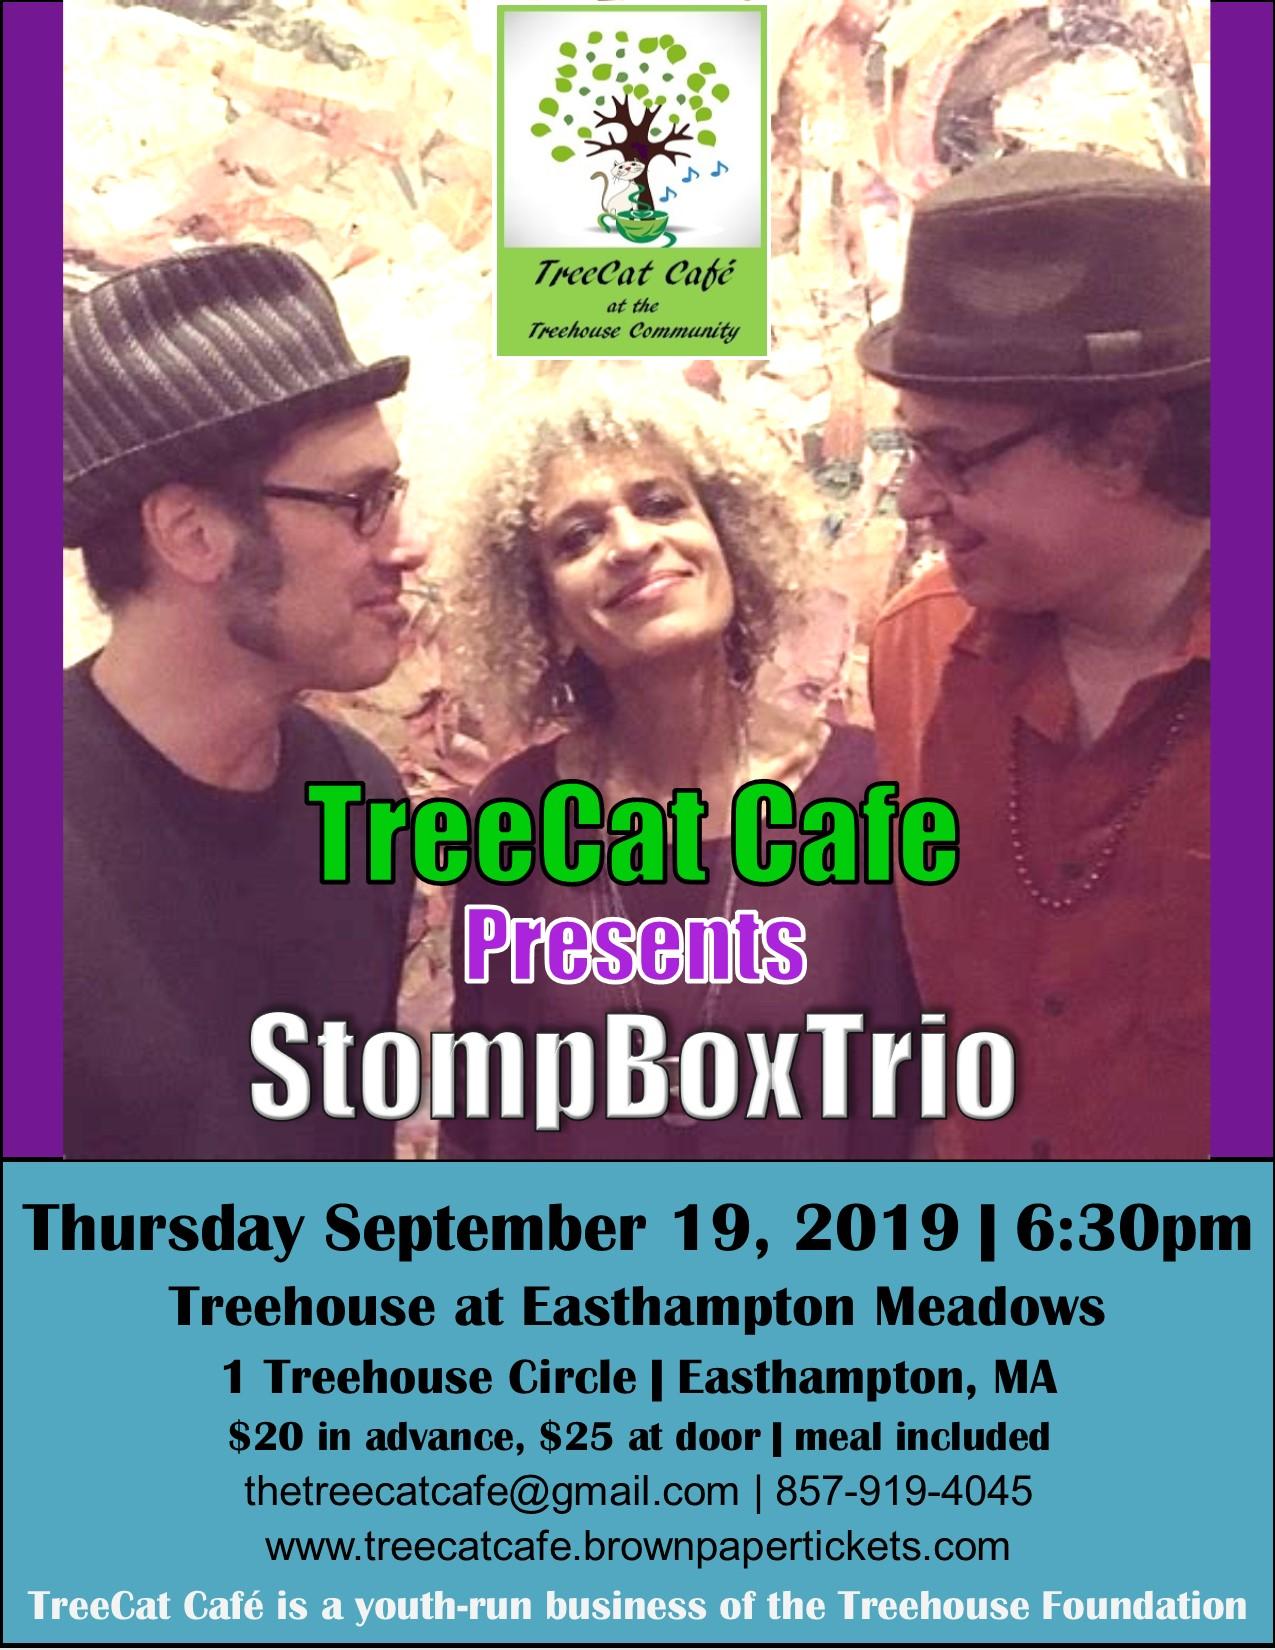 TreeCat Cafe